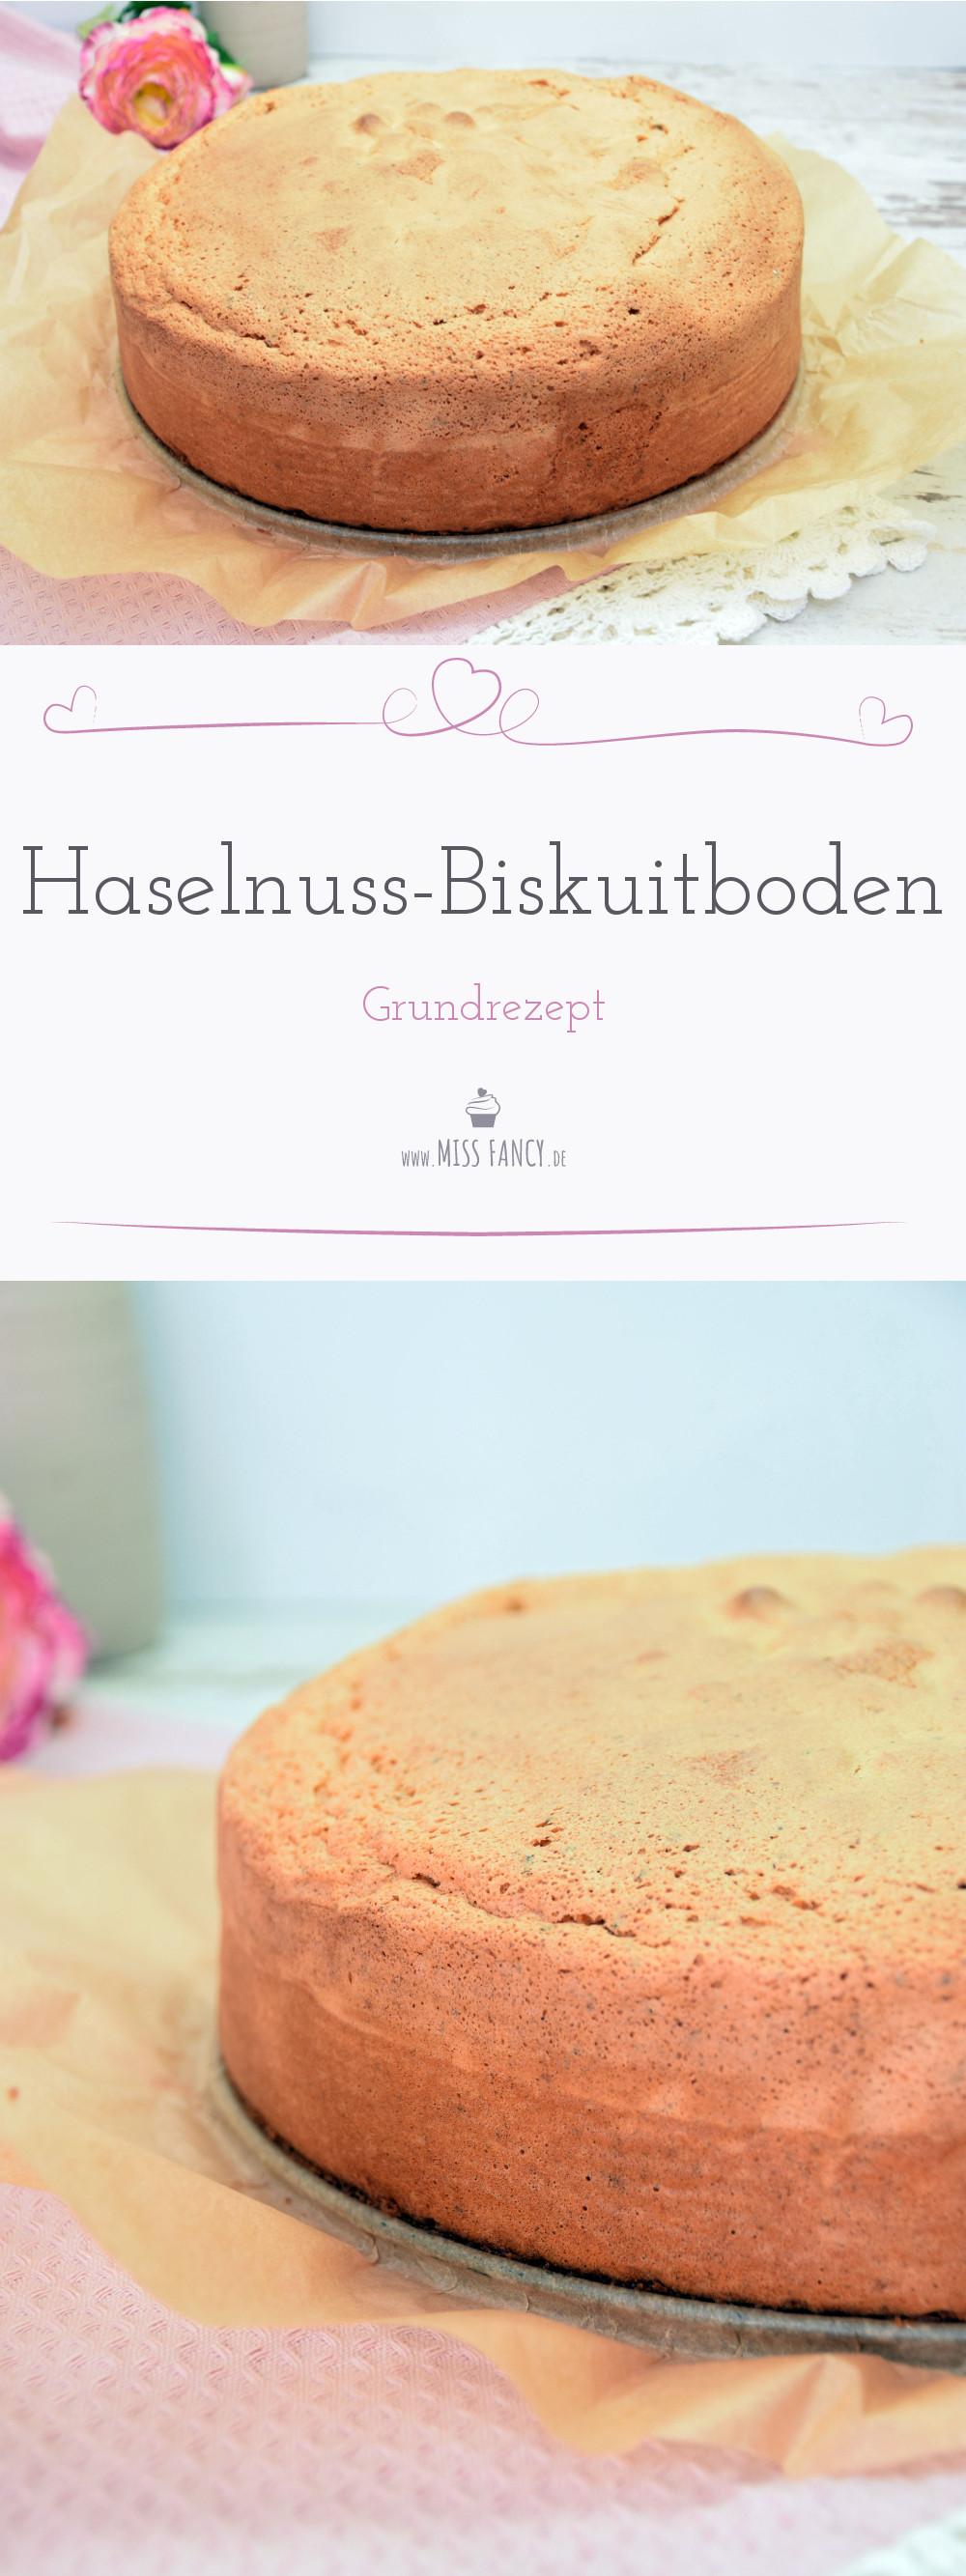 Grundrezept-Haselnuss-Biskuitboden